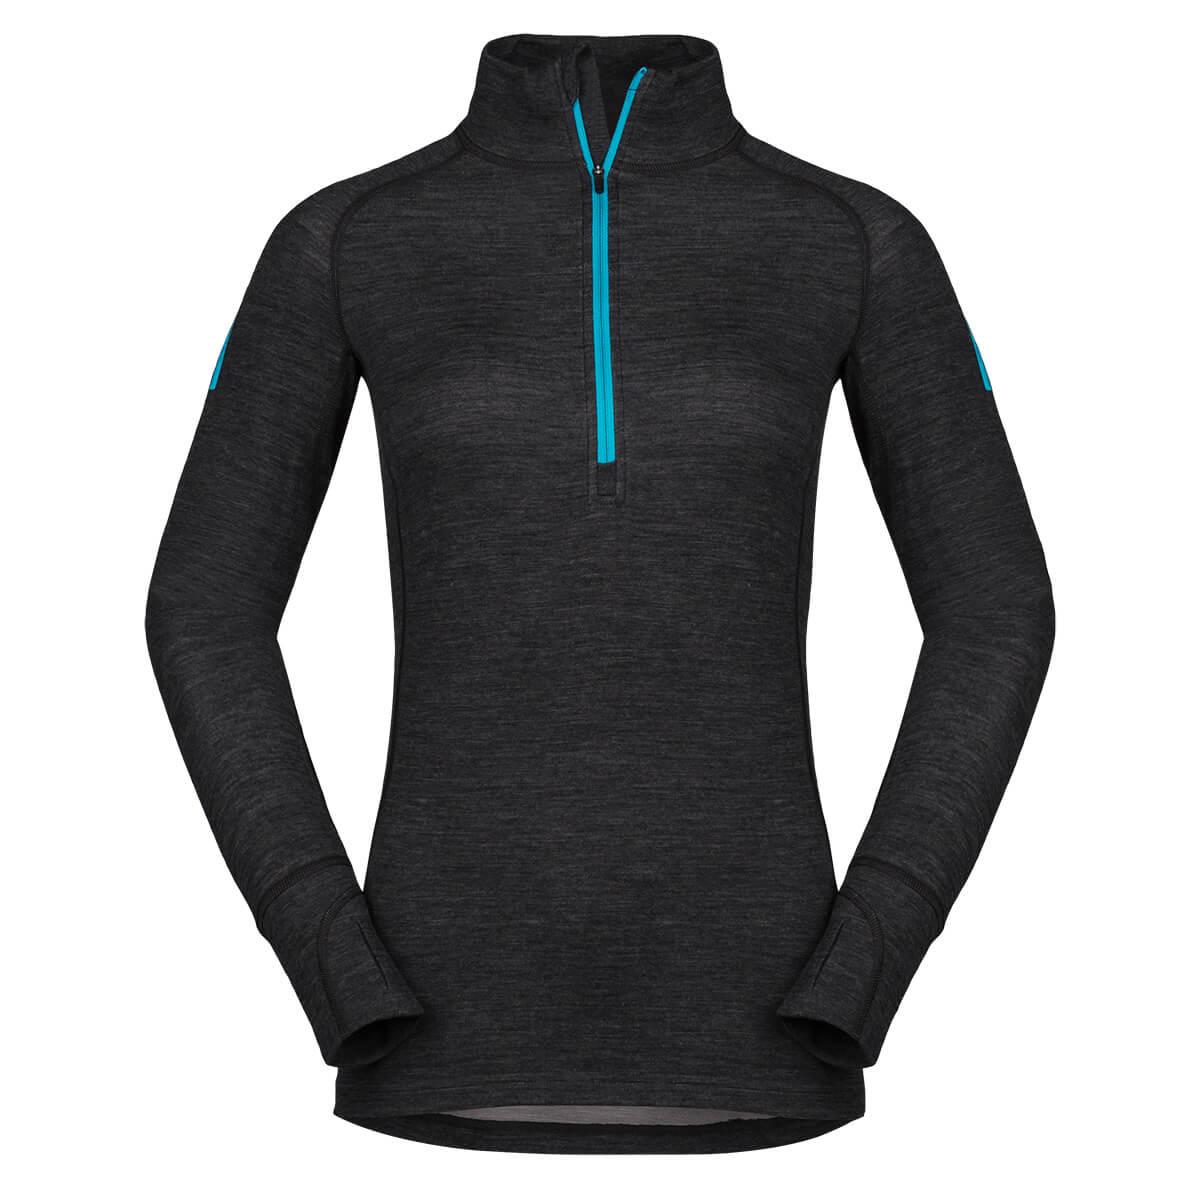 Dámske tričko Zajo Nora Merino W Zip Top LS Black - veľkosť S